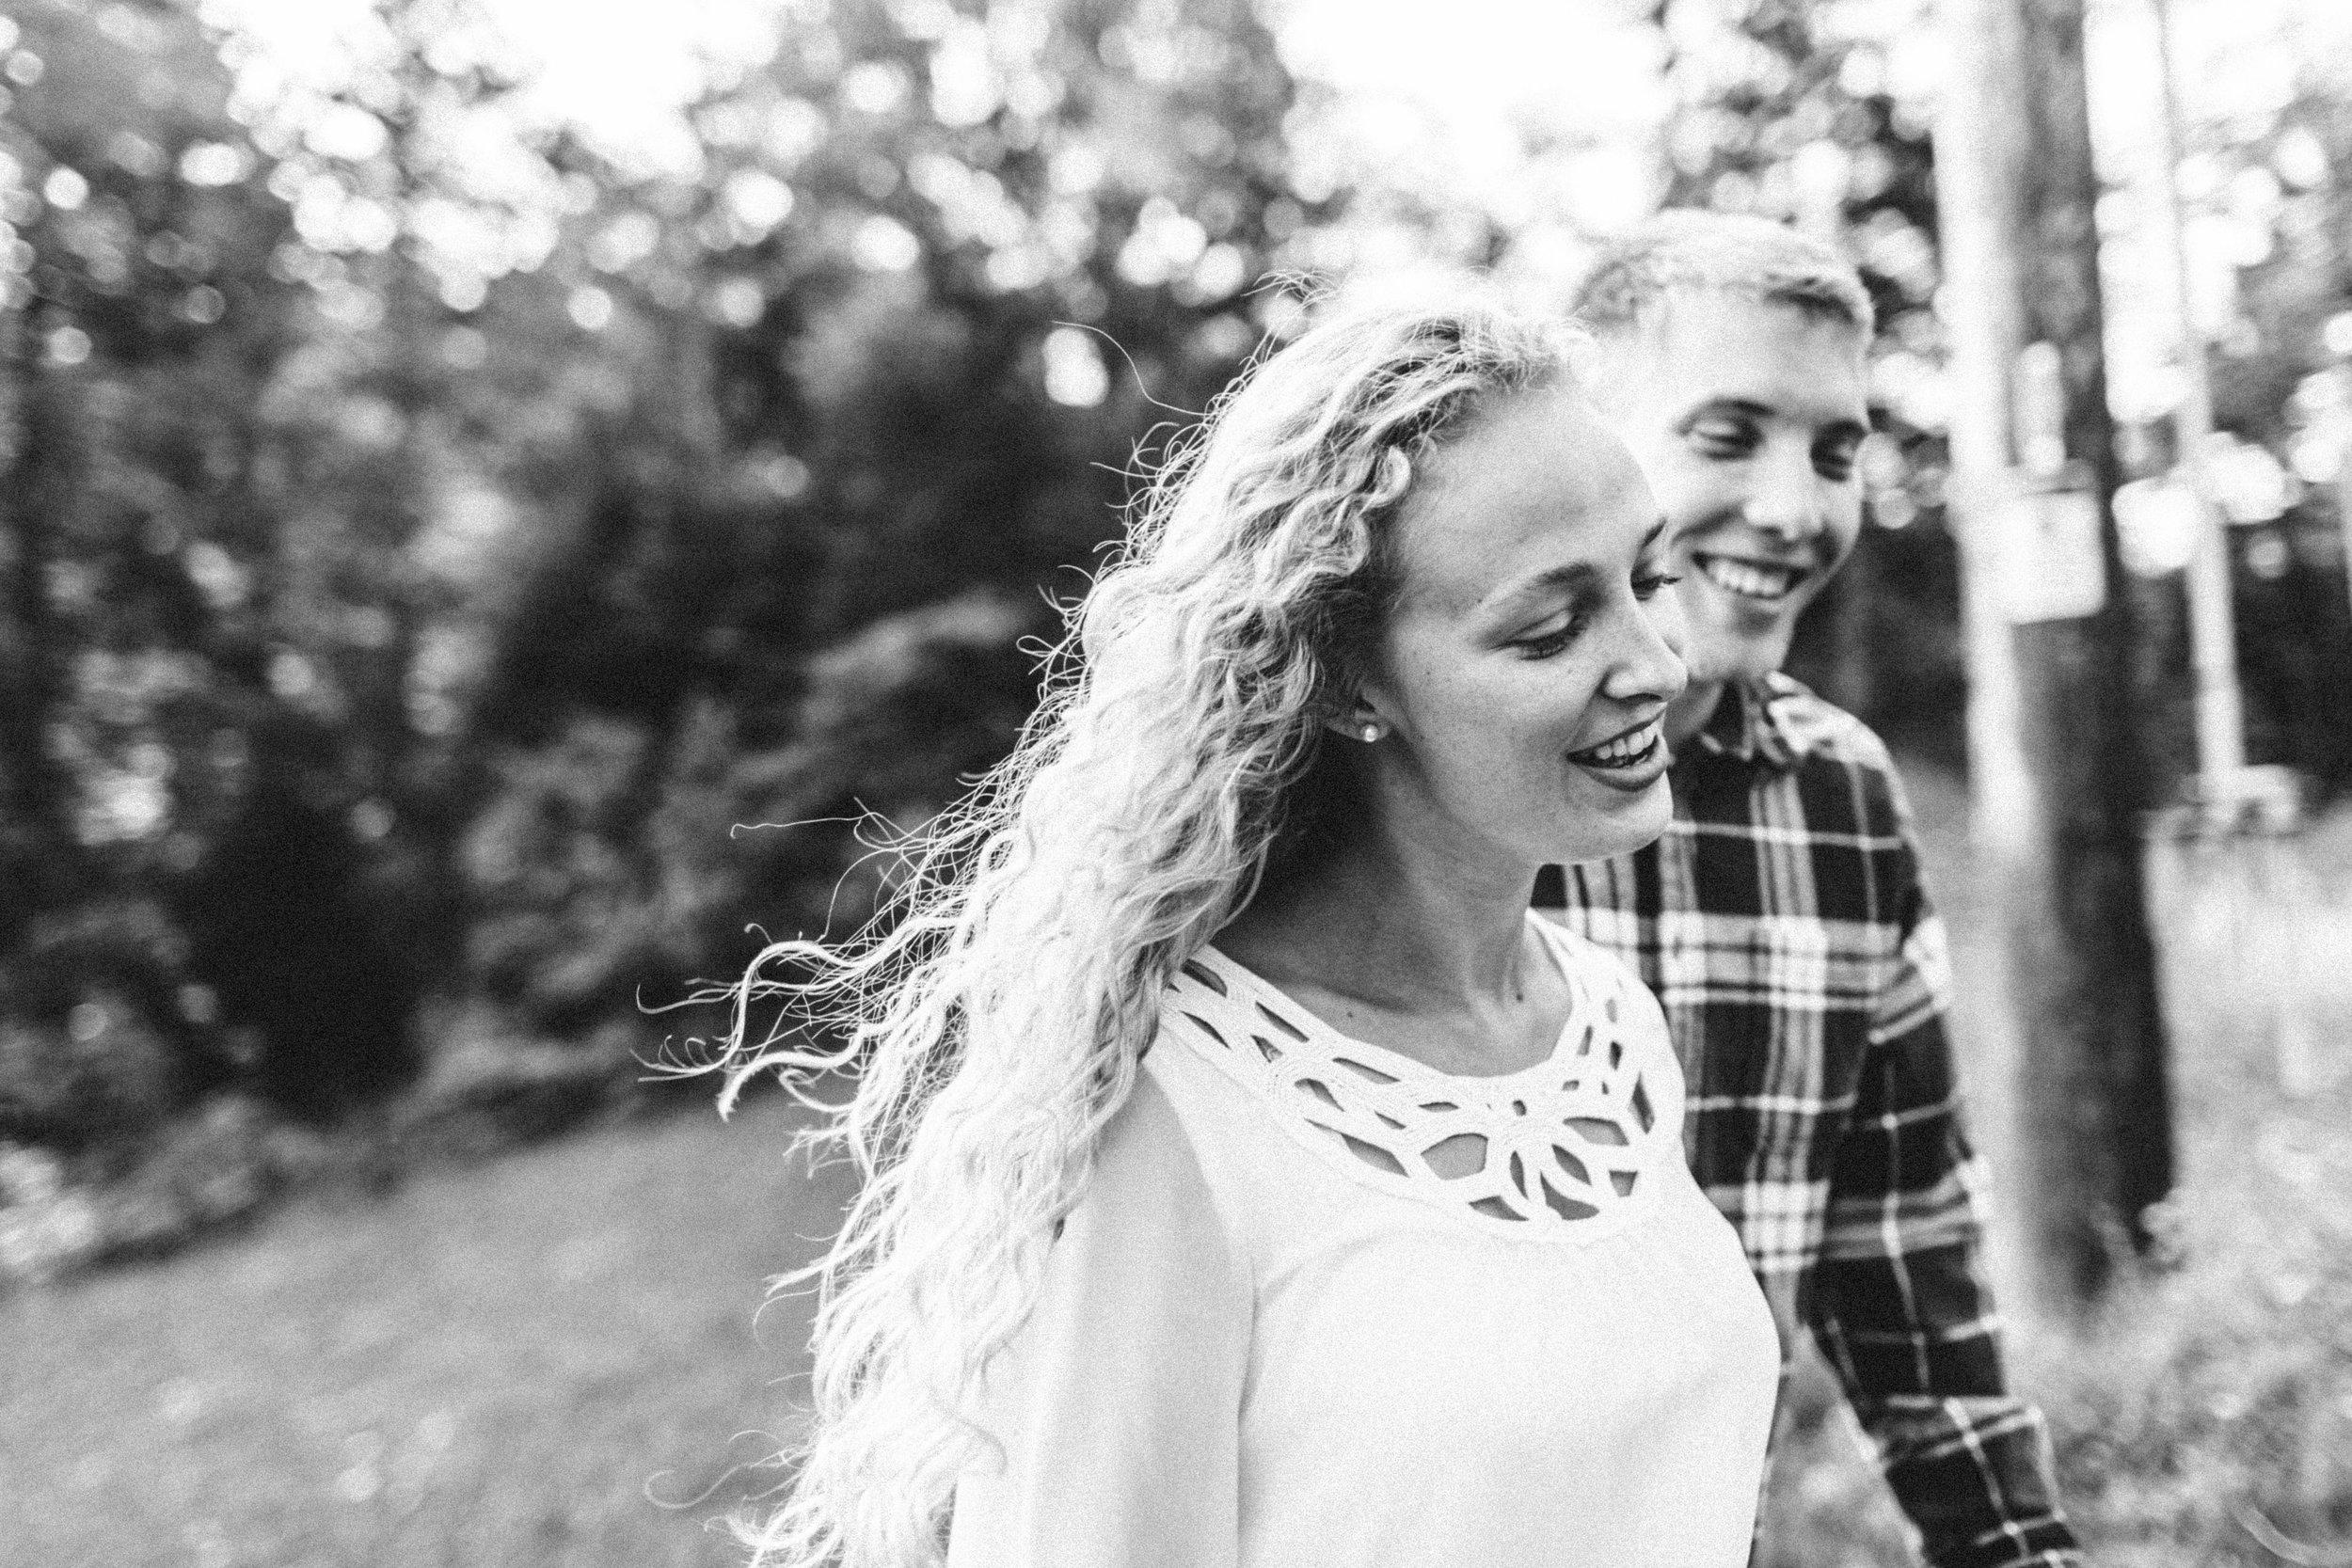 Northern Michigan Engagement Photographer - Lauren and Brent 051.jpg